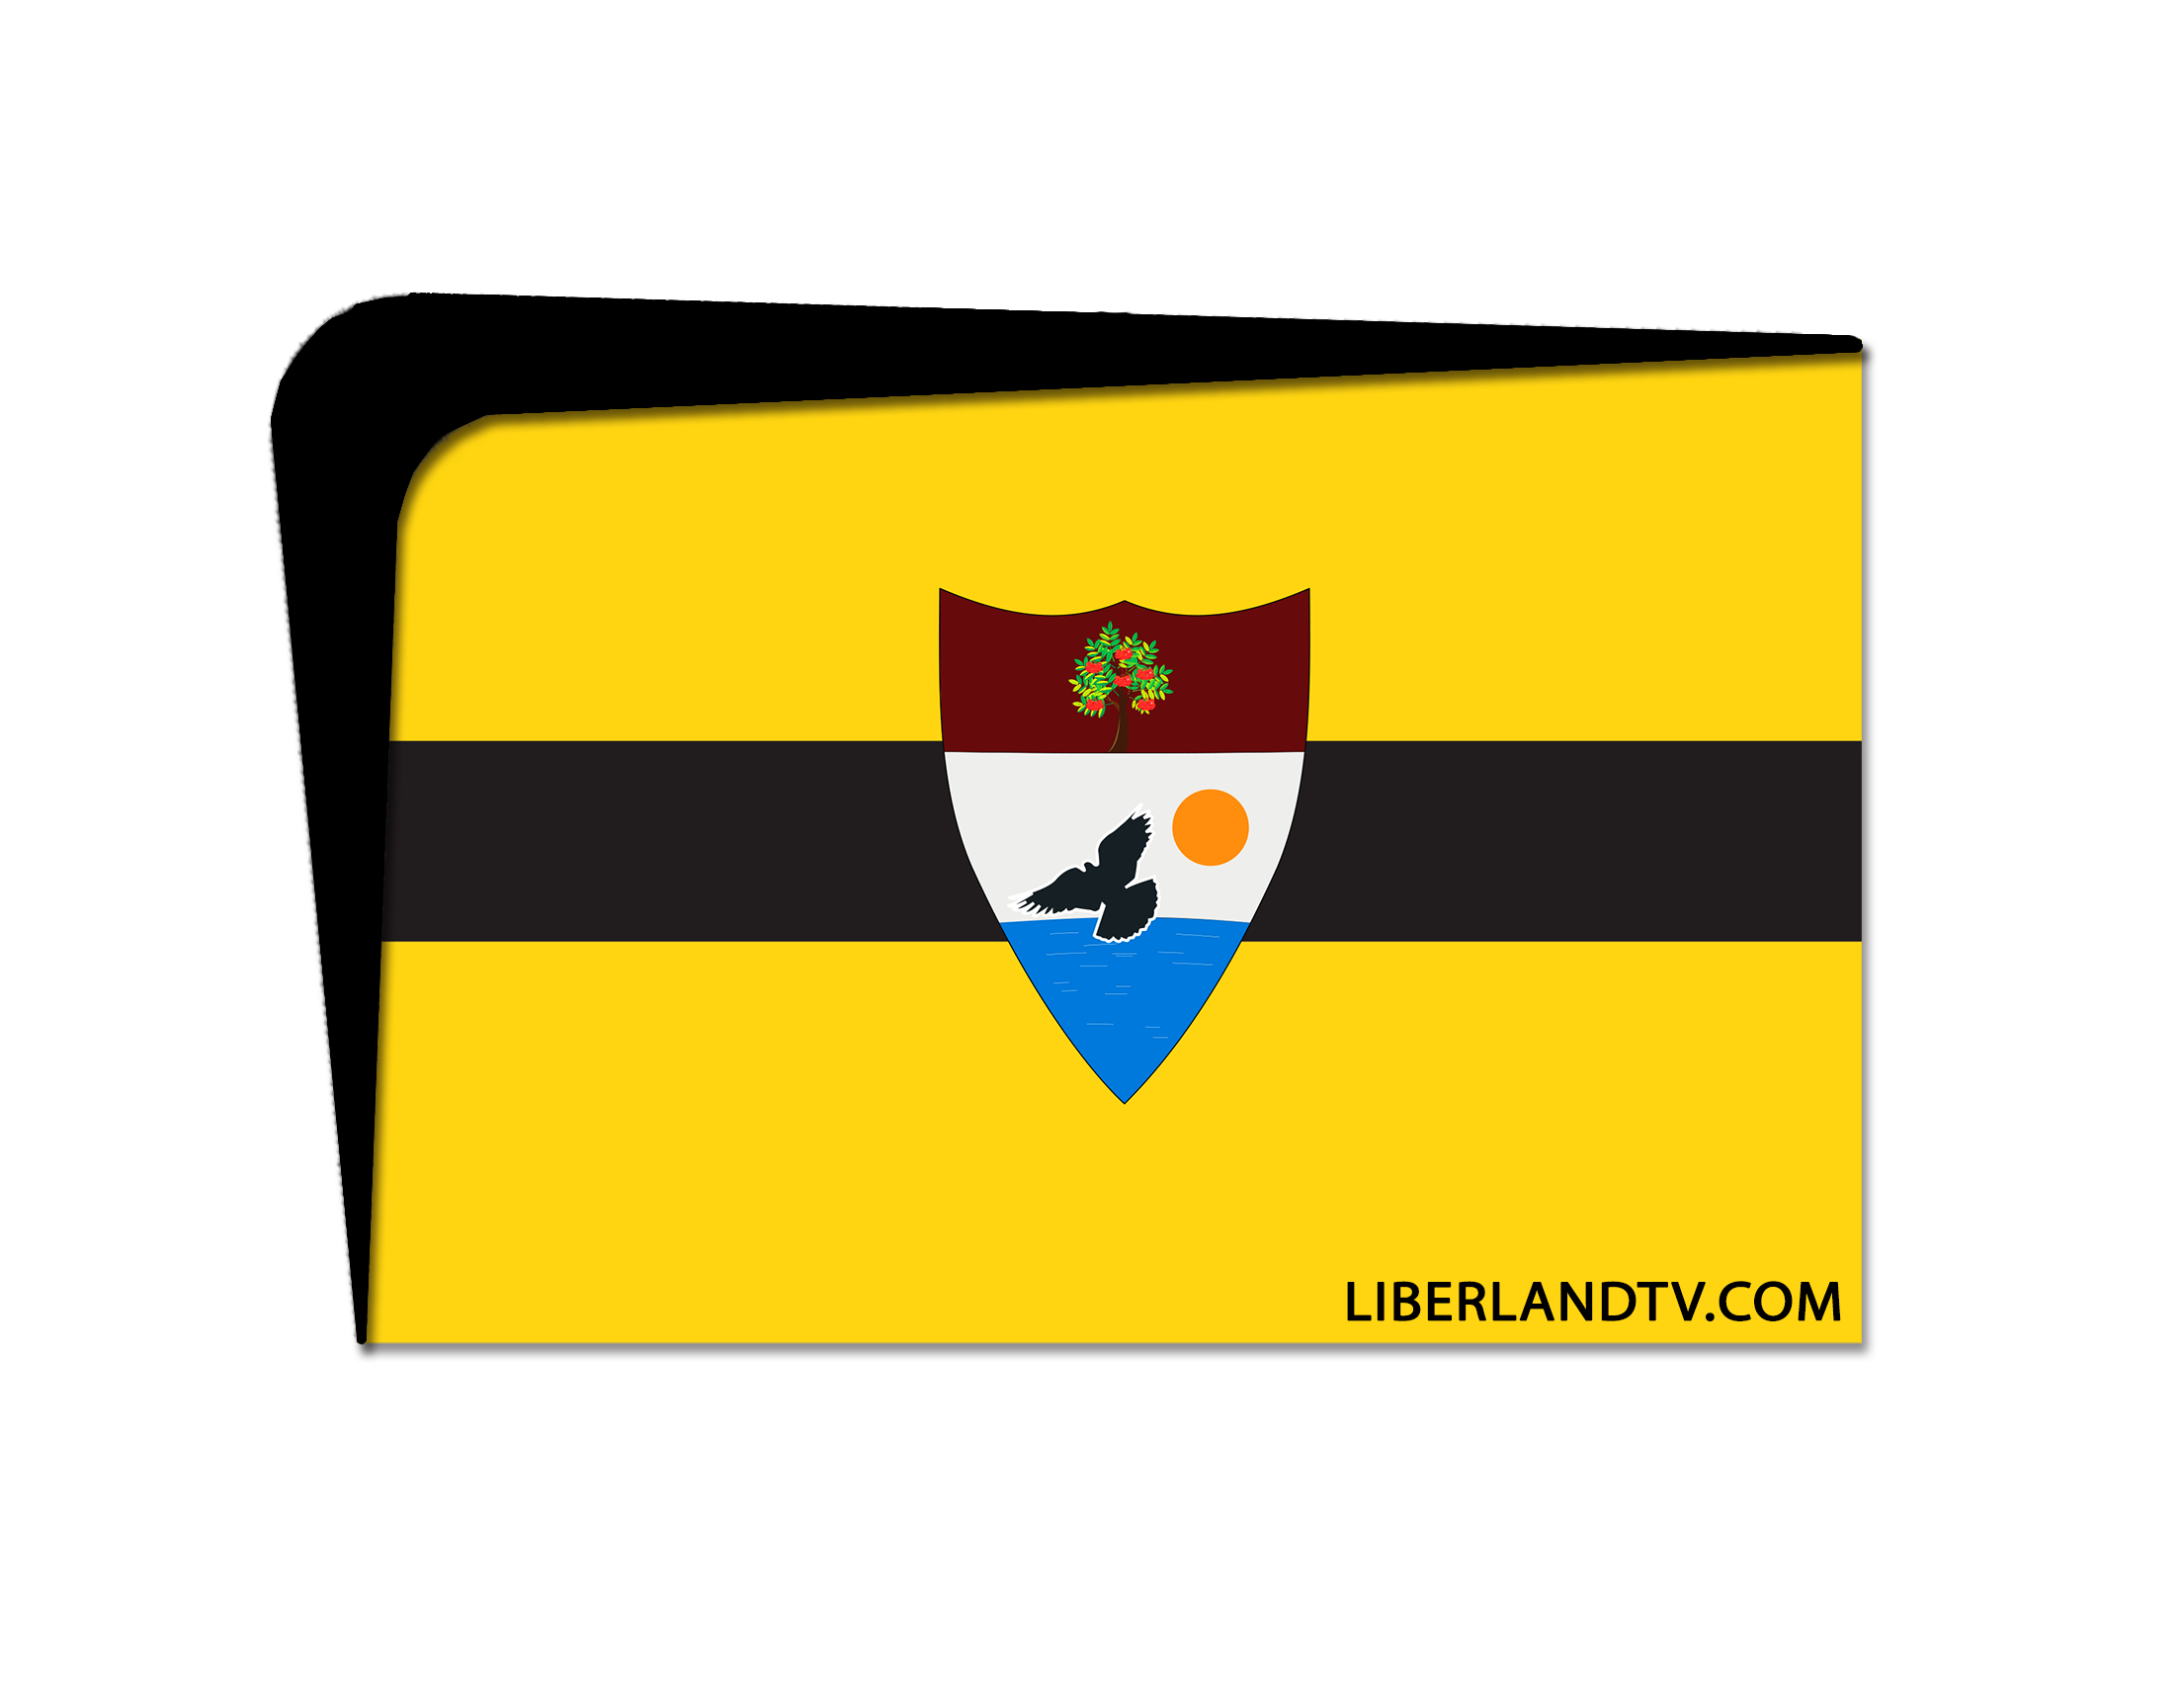 Liberland TV